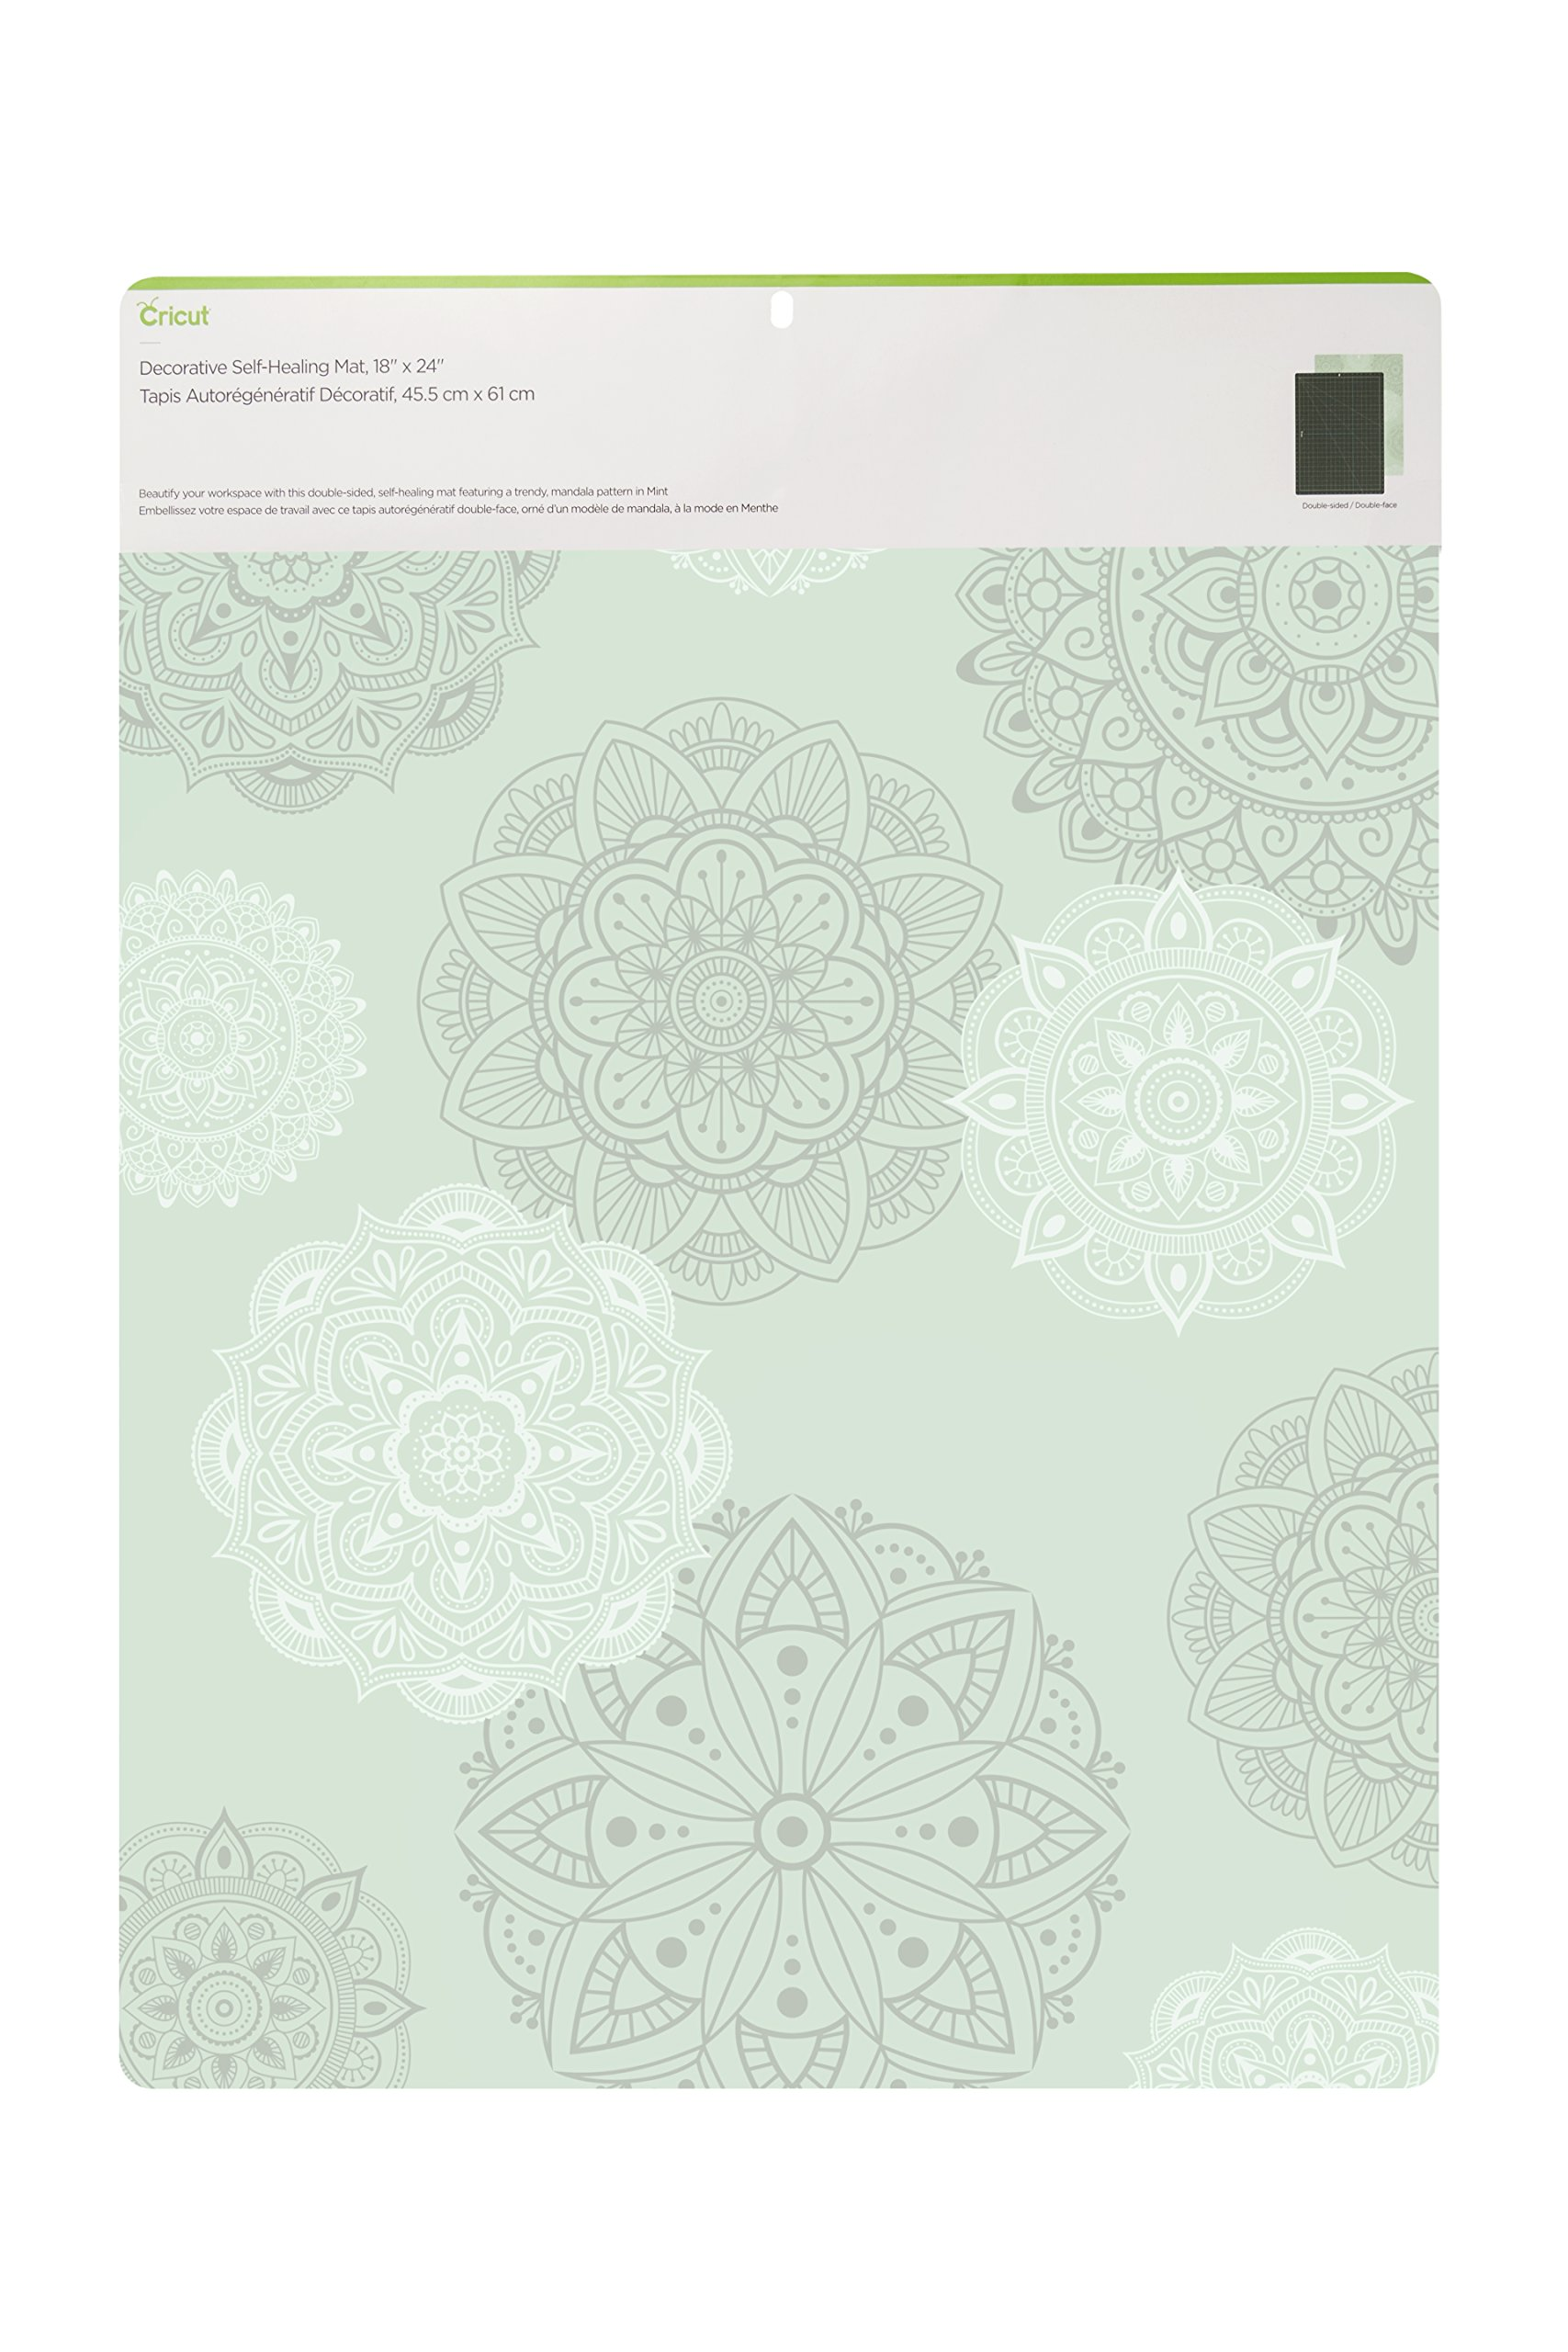 Cricut 2004712 18'' x 24'' Deco Self Healing Mat, 18x24-Inches, Mint